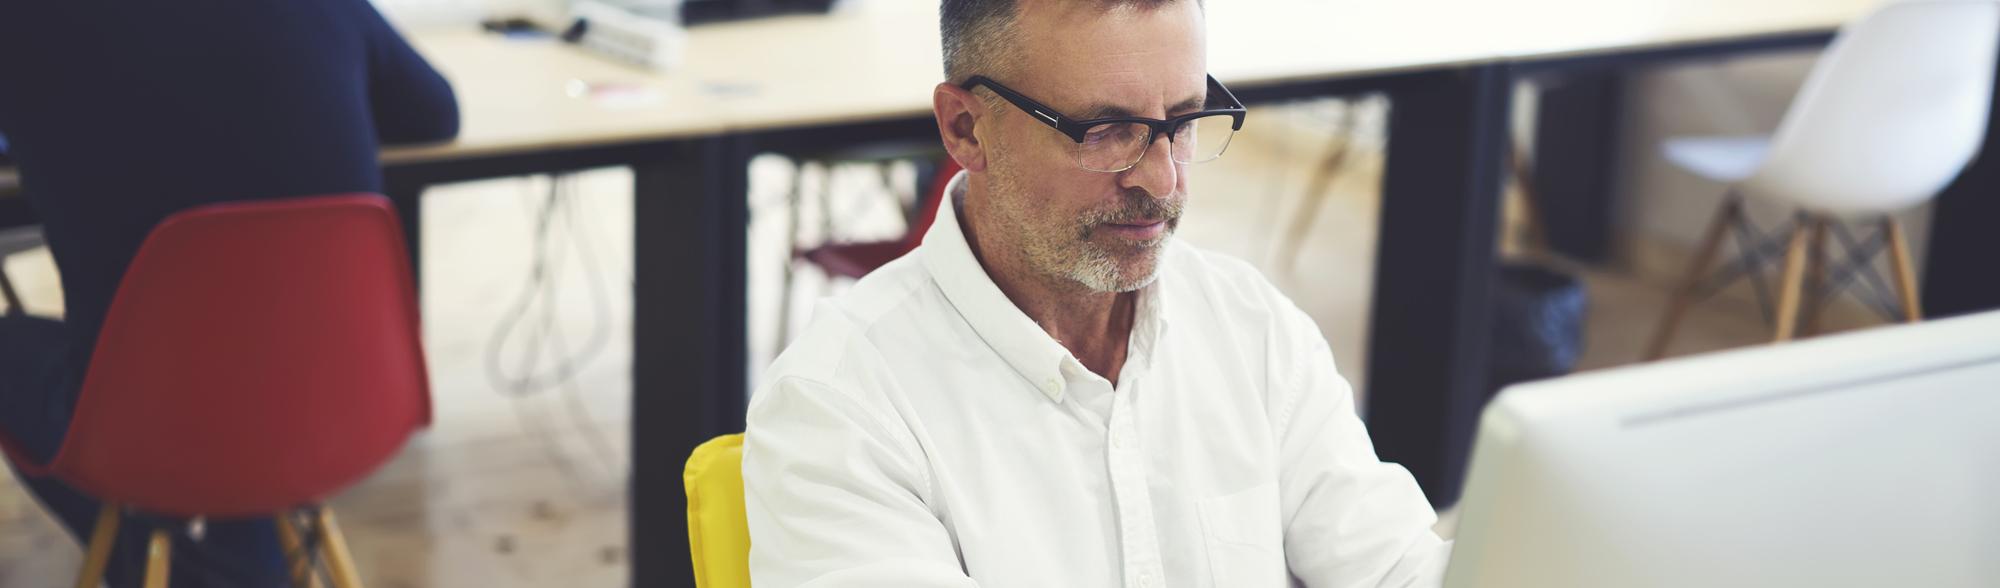 A photograph of an office worker using a computer